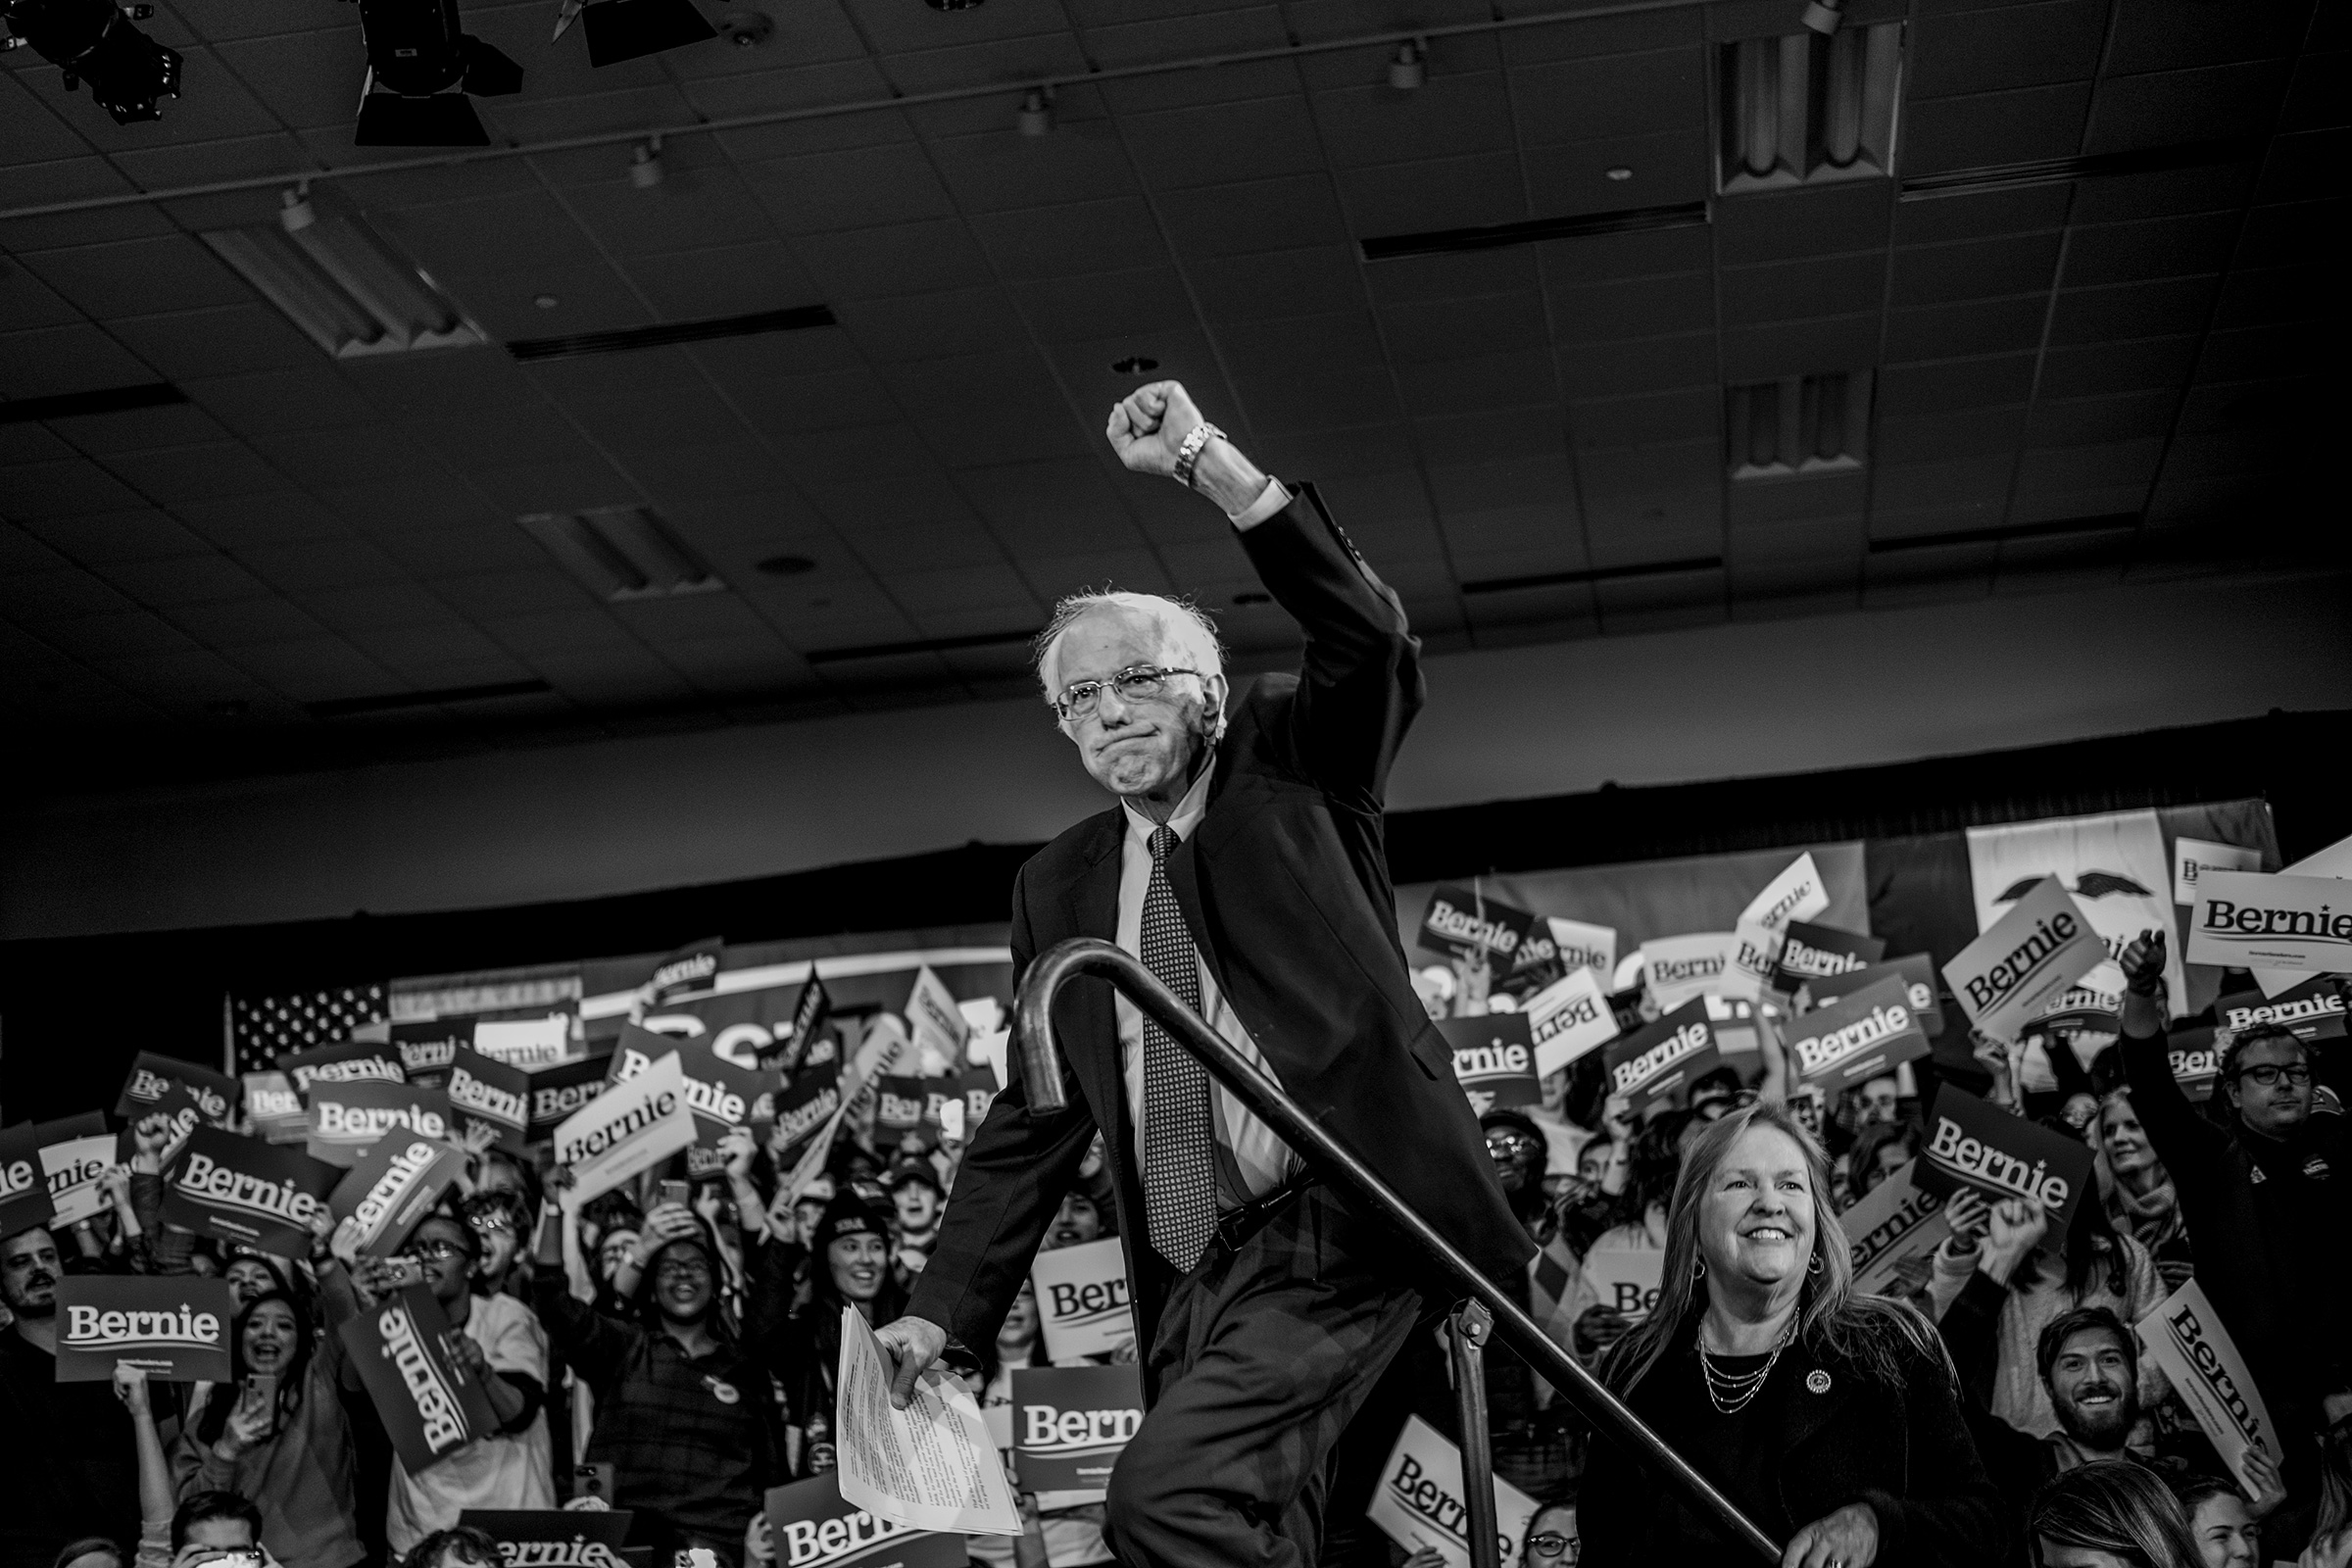 Bernie Sanders Suspends Campaign